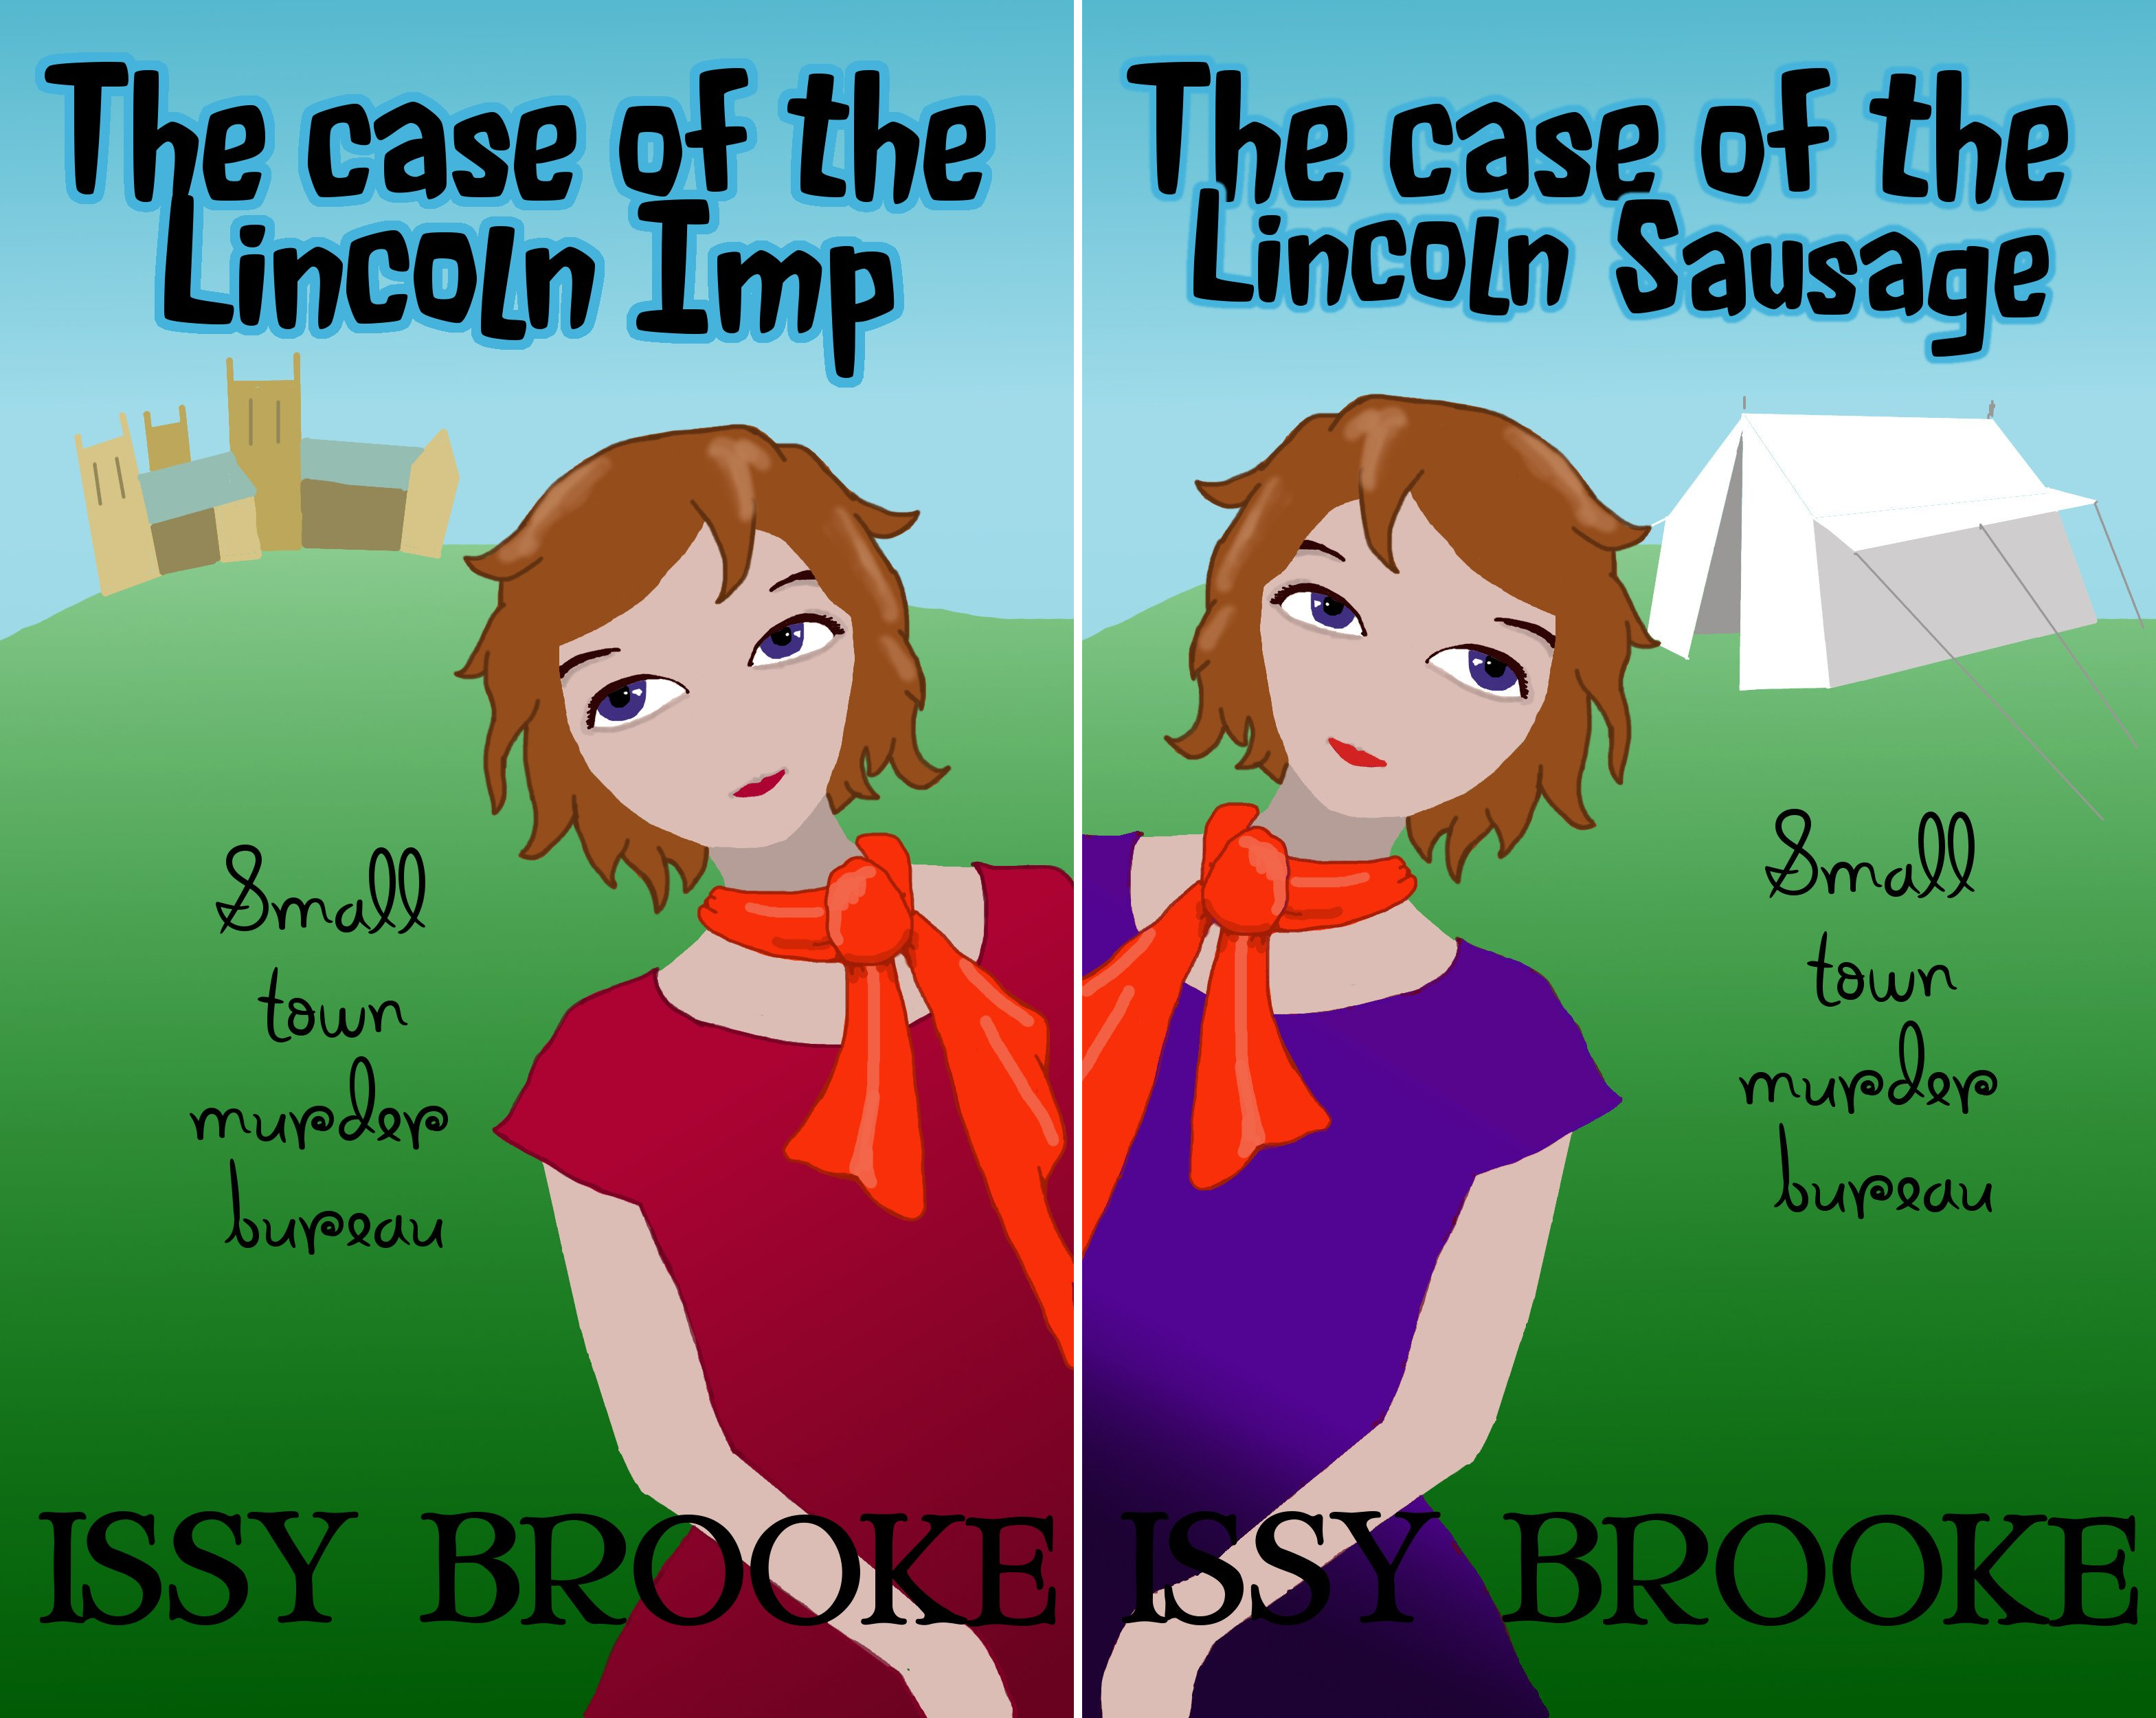 Small Town Murder Bureau (2 Book Series)